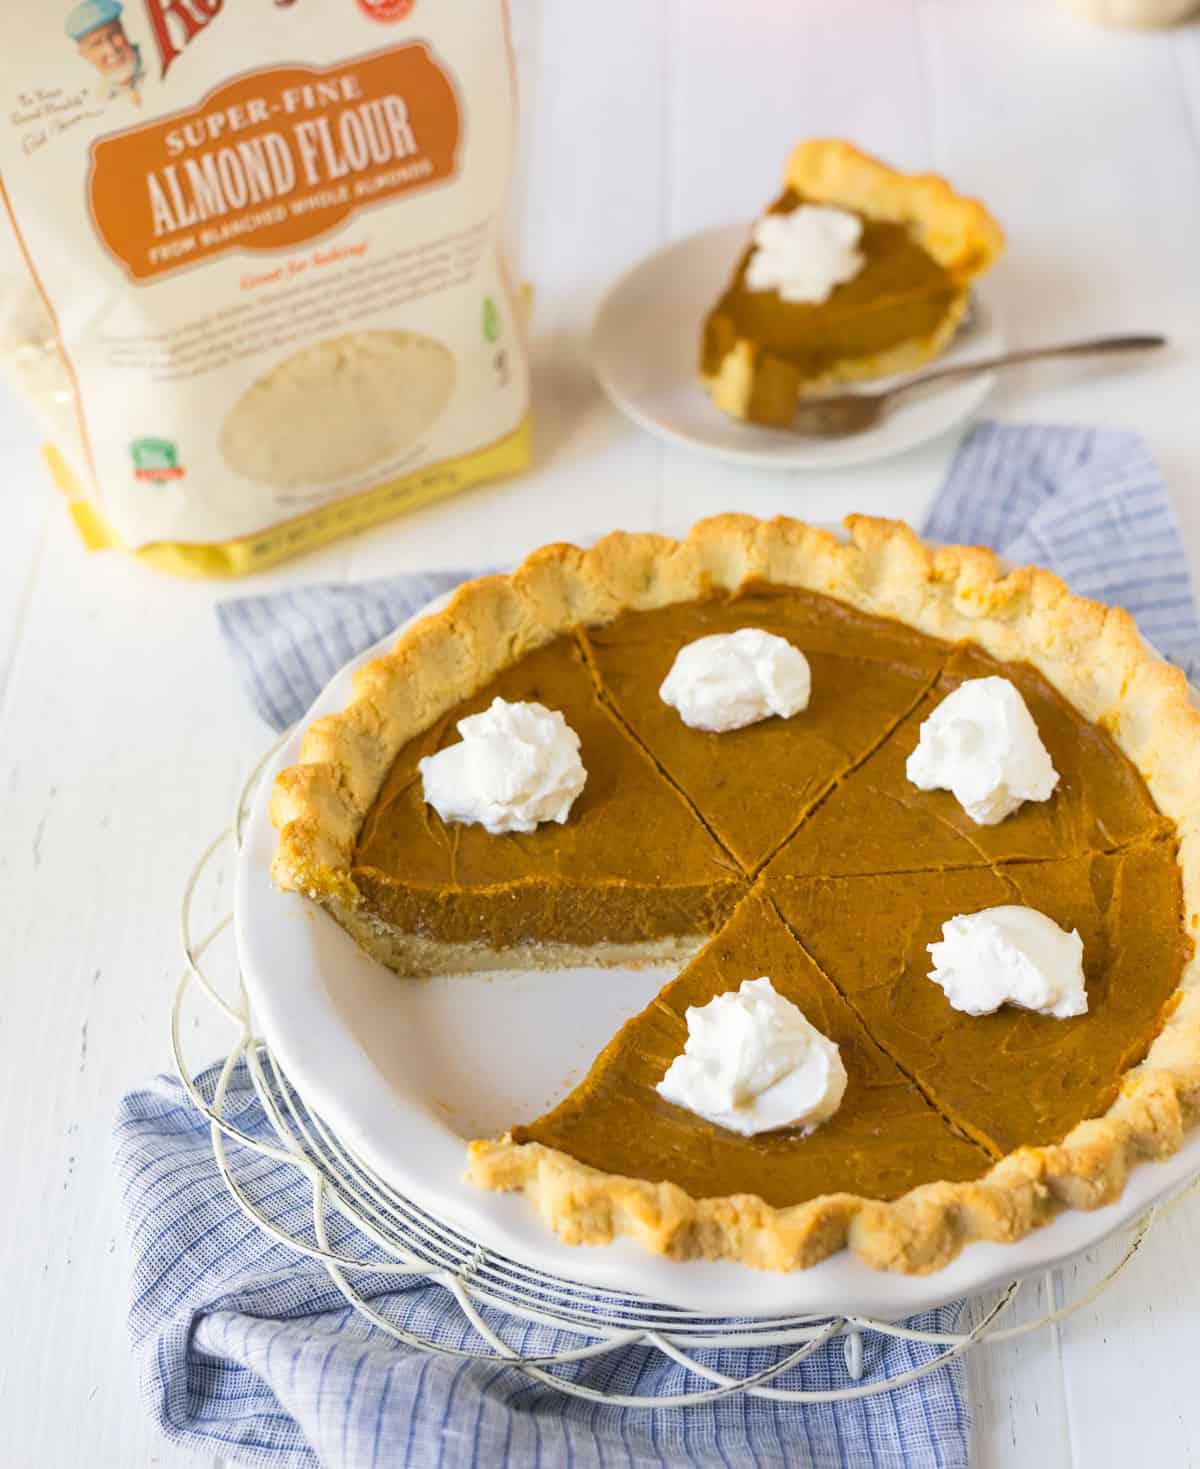 Vegan Pumpkin Pie. Creamy, gluten-free, and perfect for Thanksgiving!